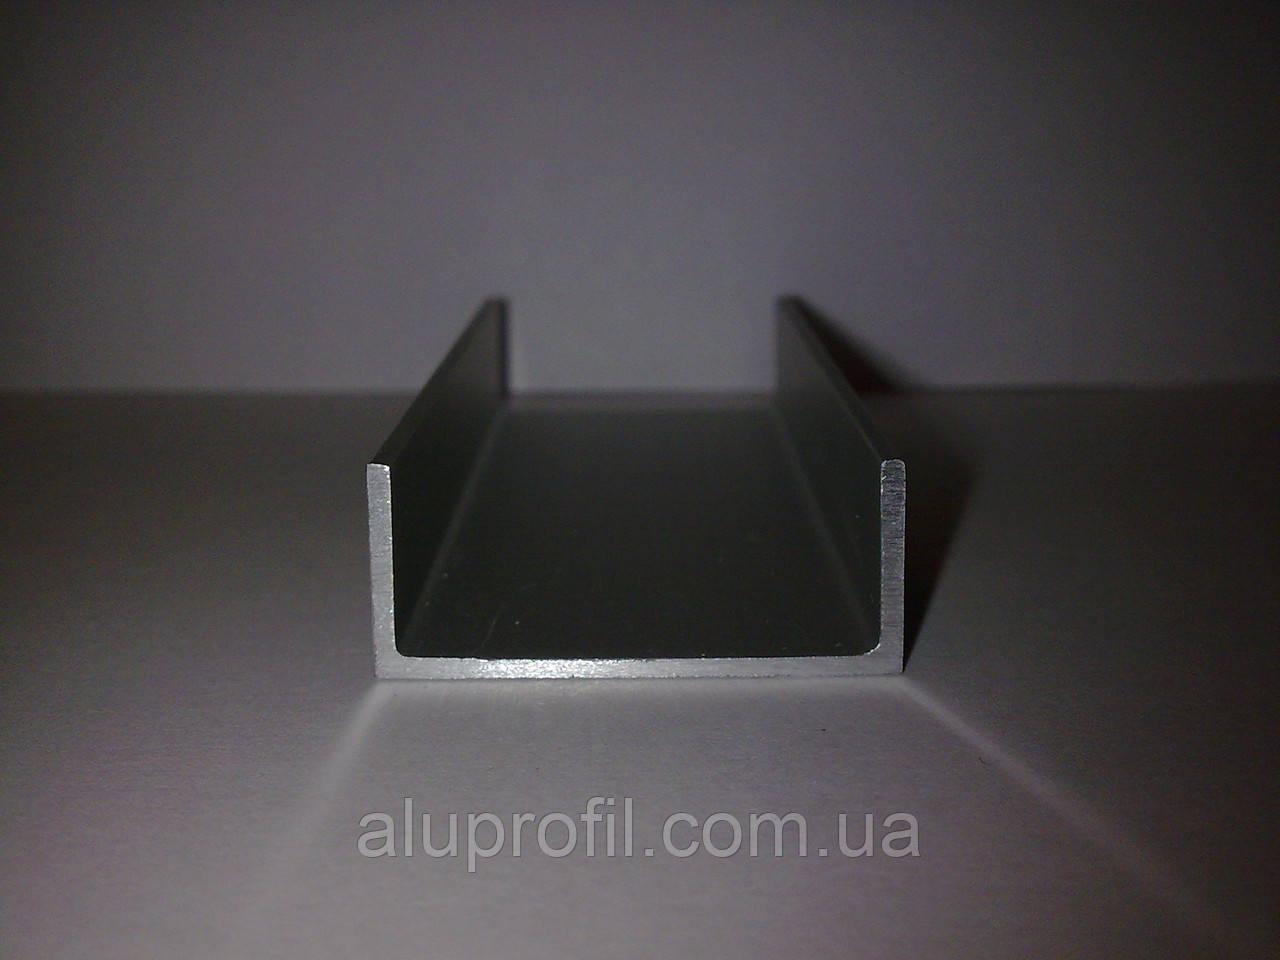 Алюминиевый профиль — п-образный алюминиевый профиль (швеллер) 20х10х1,5 Б/П